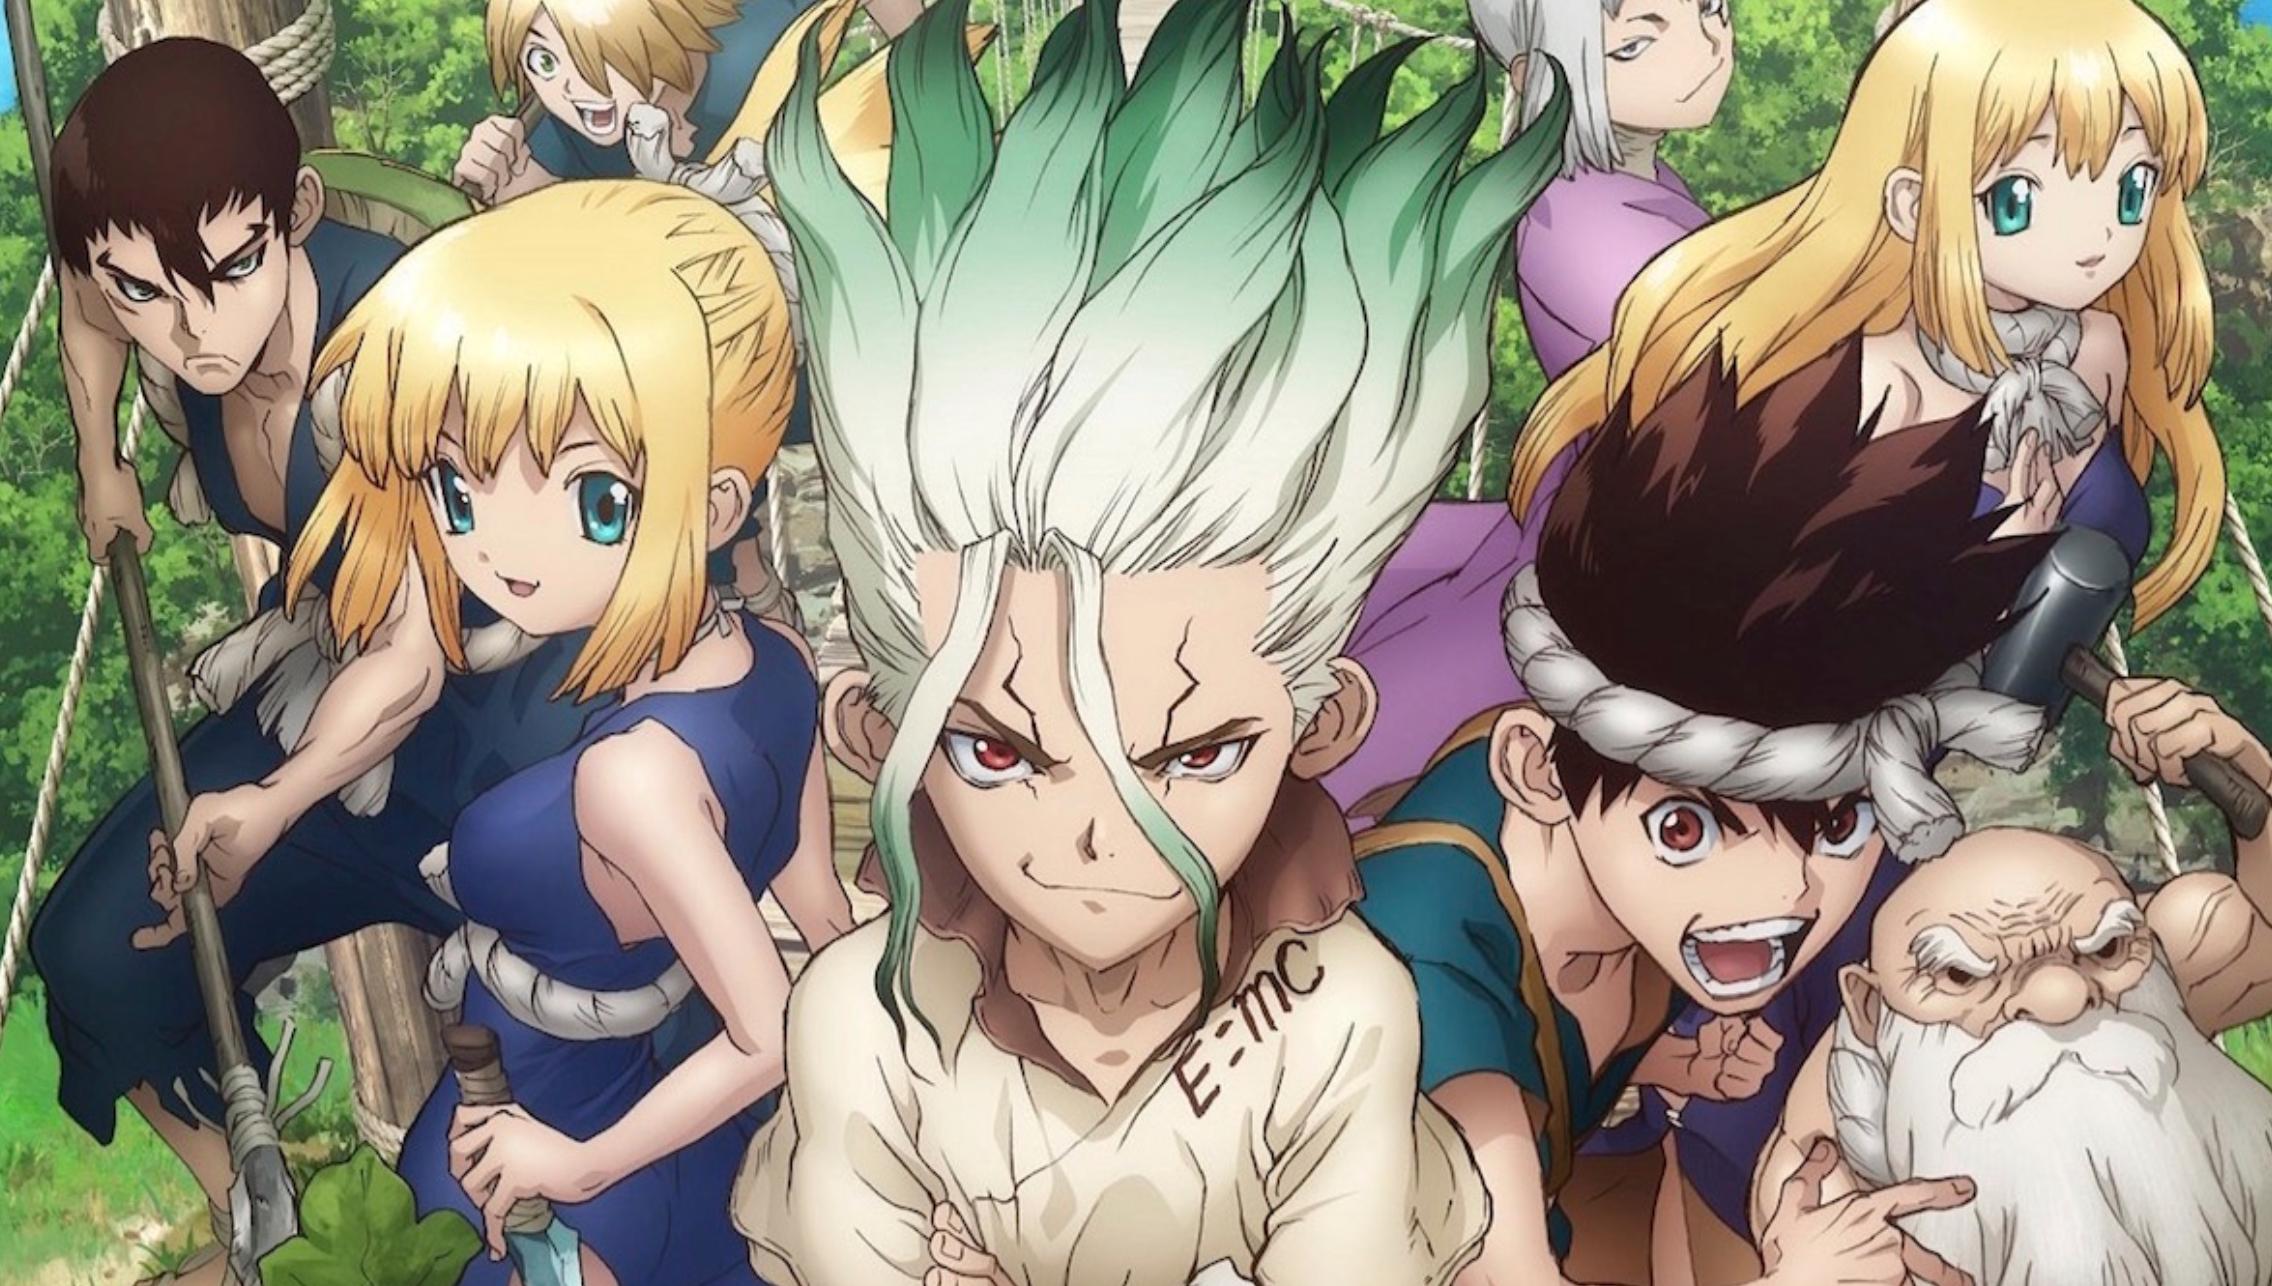 New series on anime net